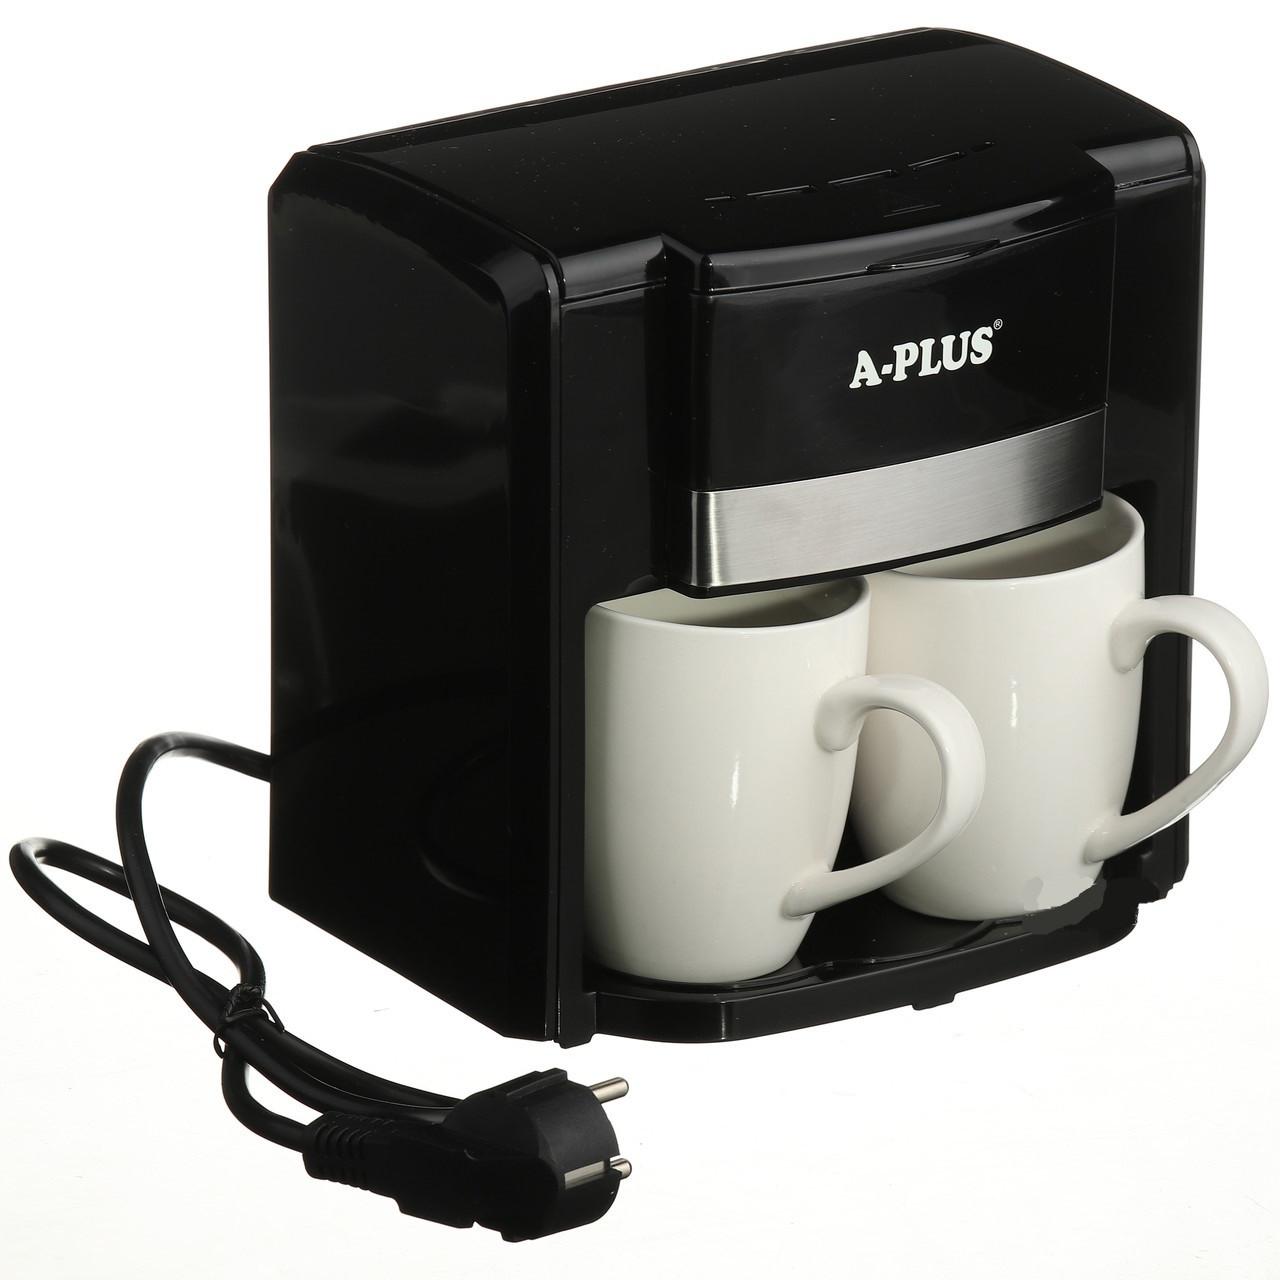 Кофеварка A-PLUS 500 Ватт на 2 чашки